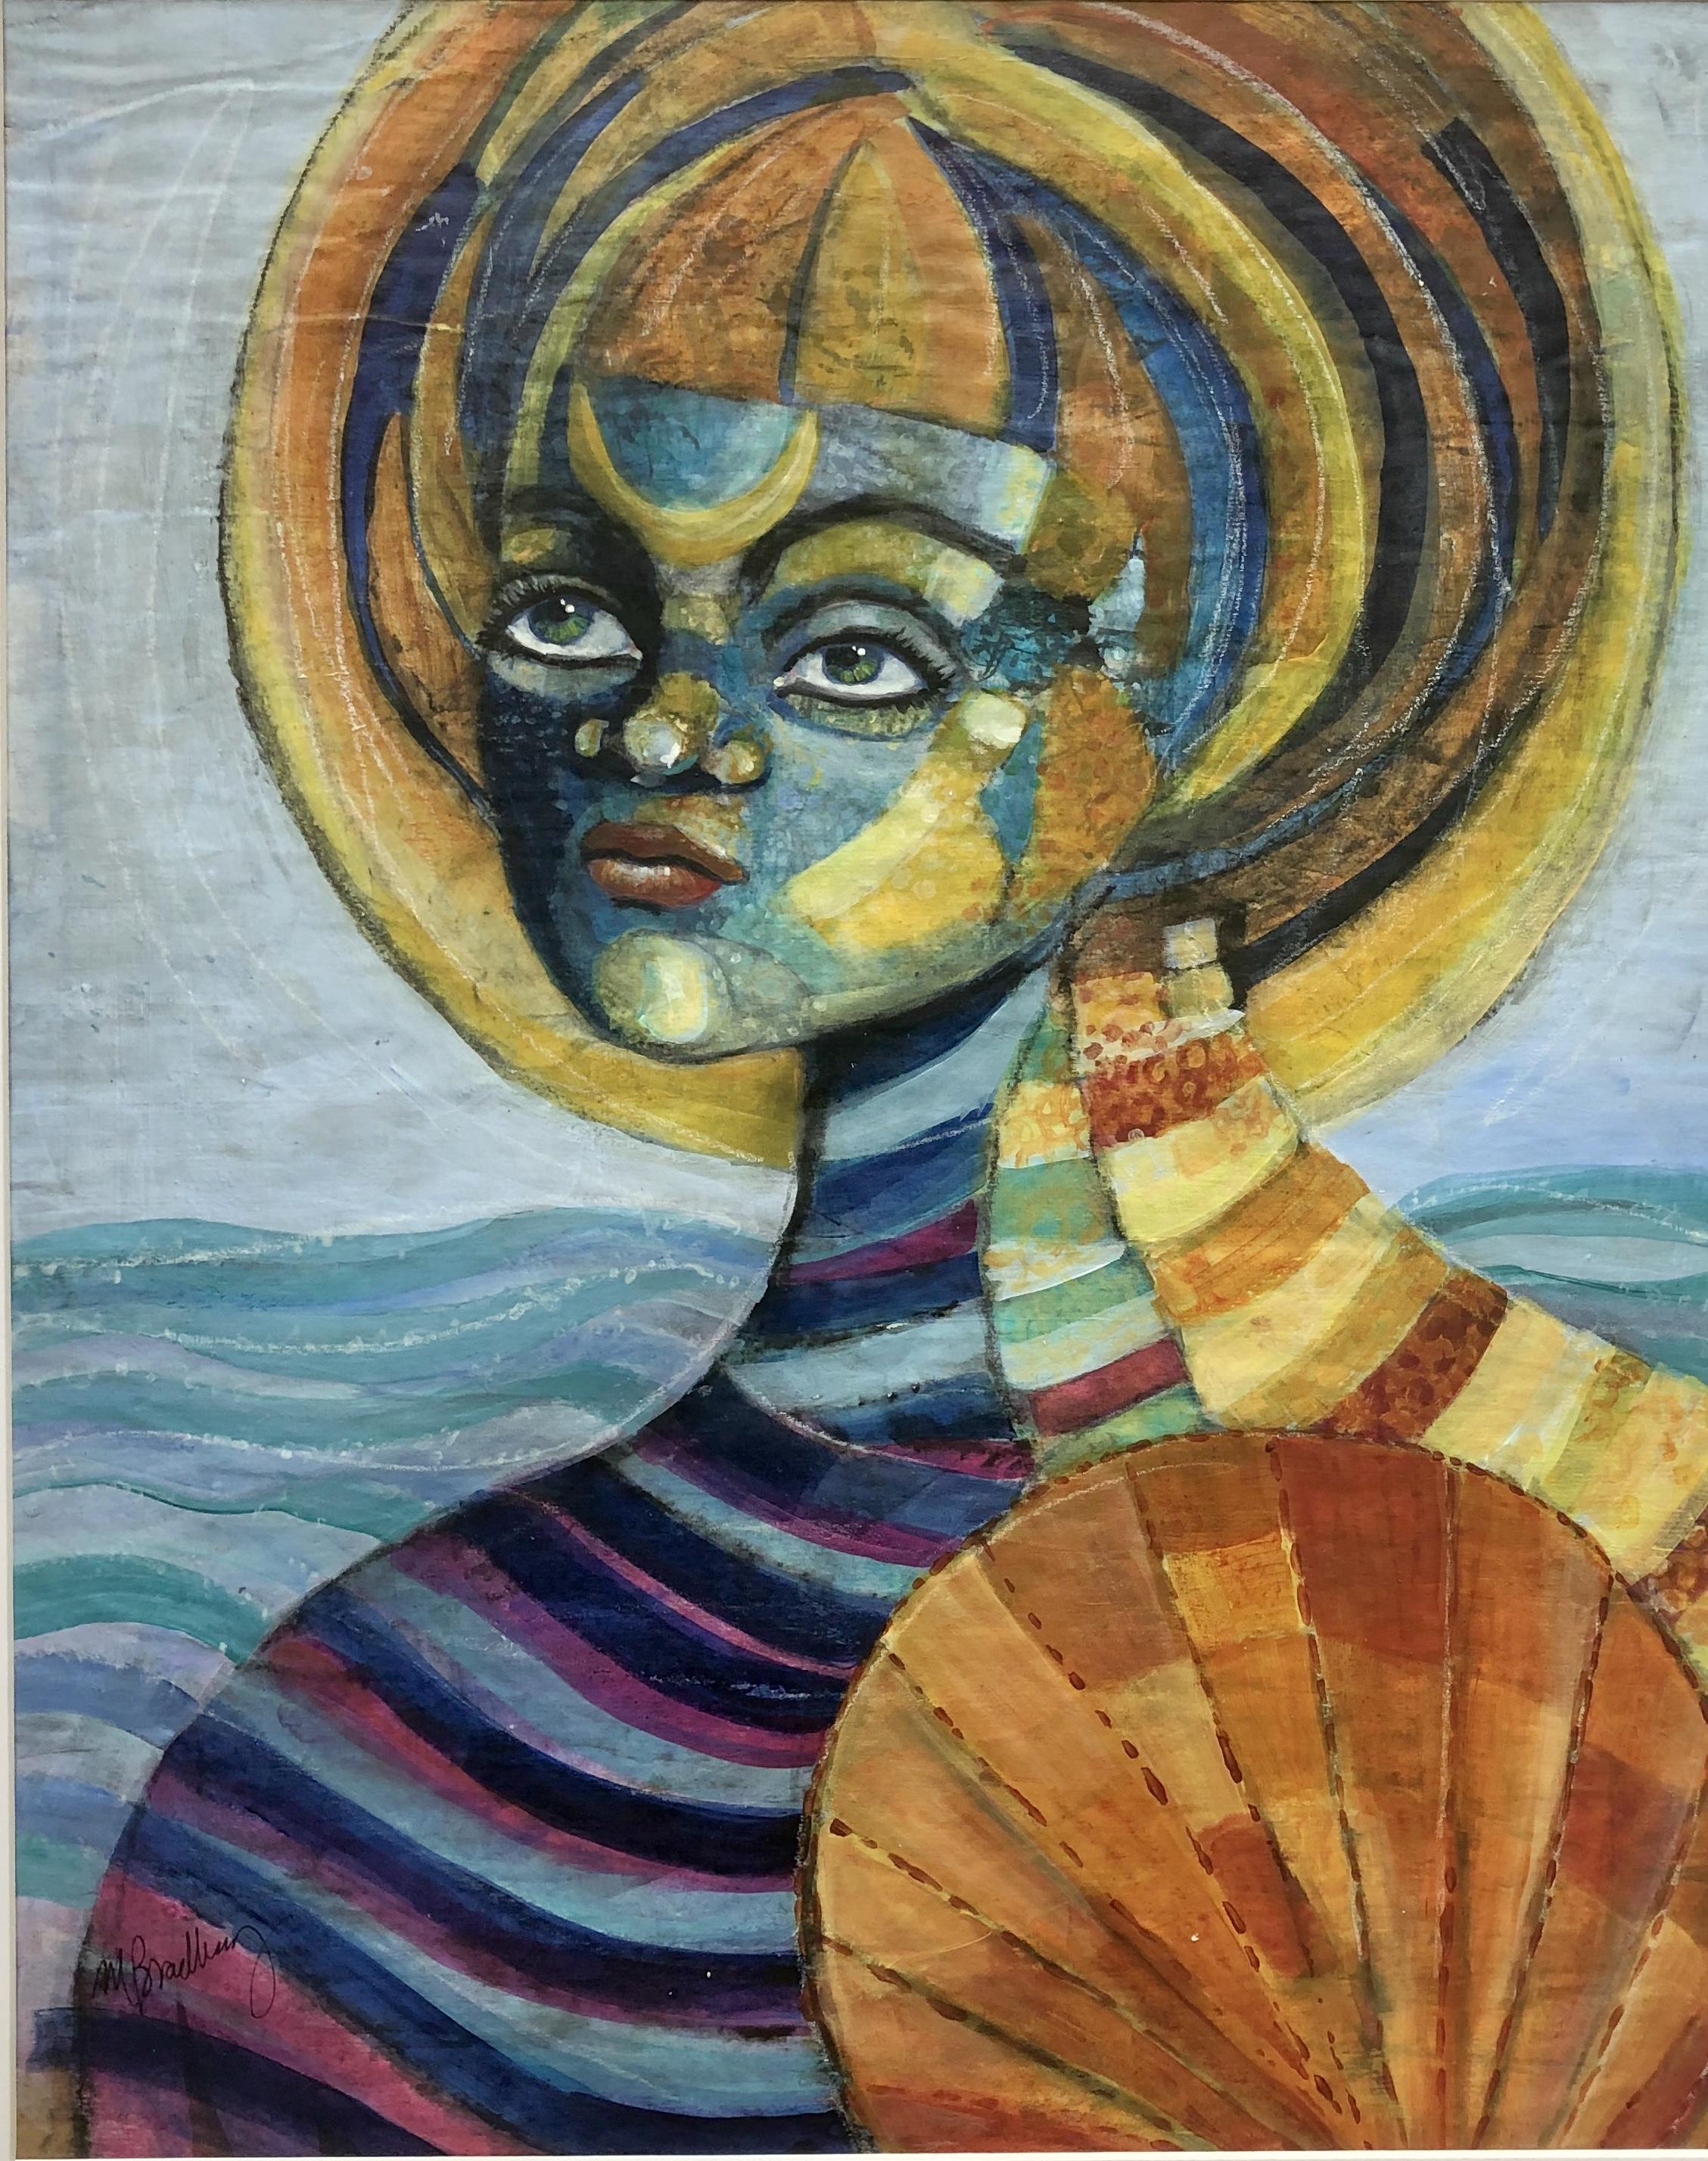 Oshun, River Goddess